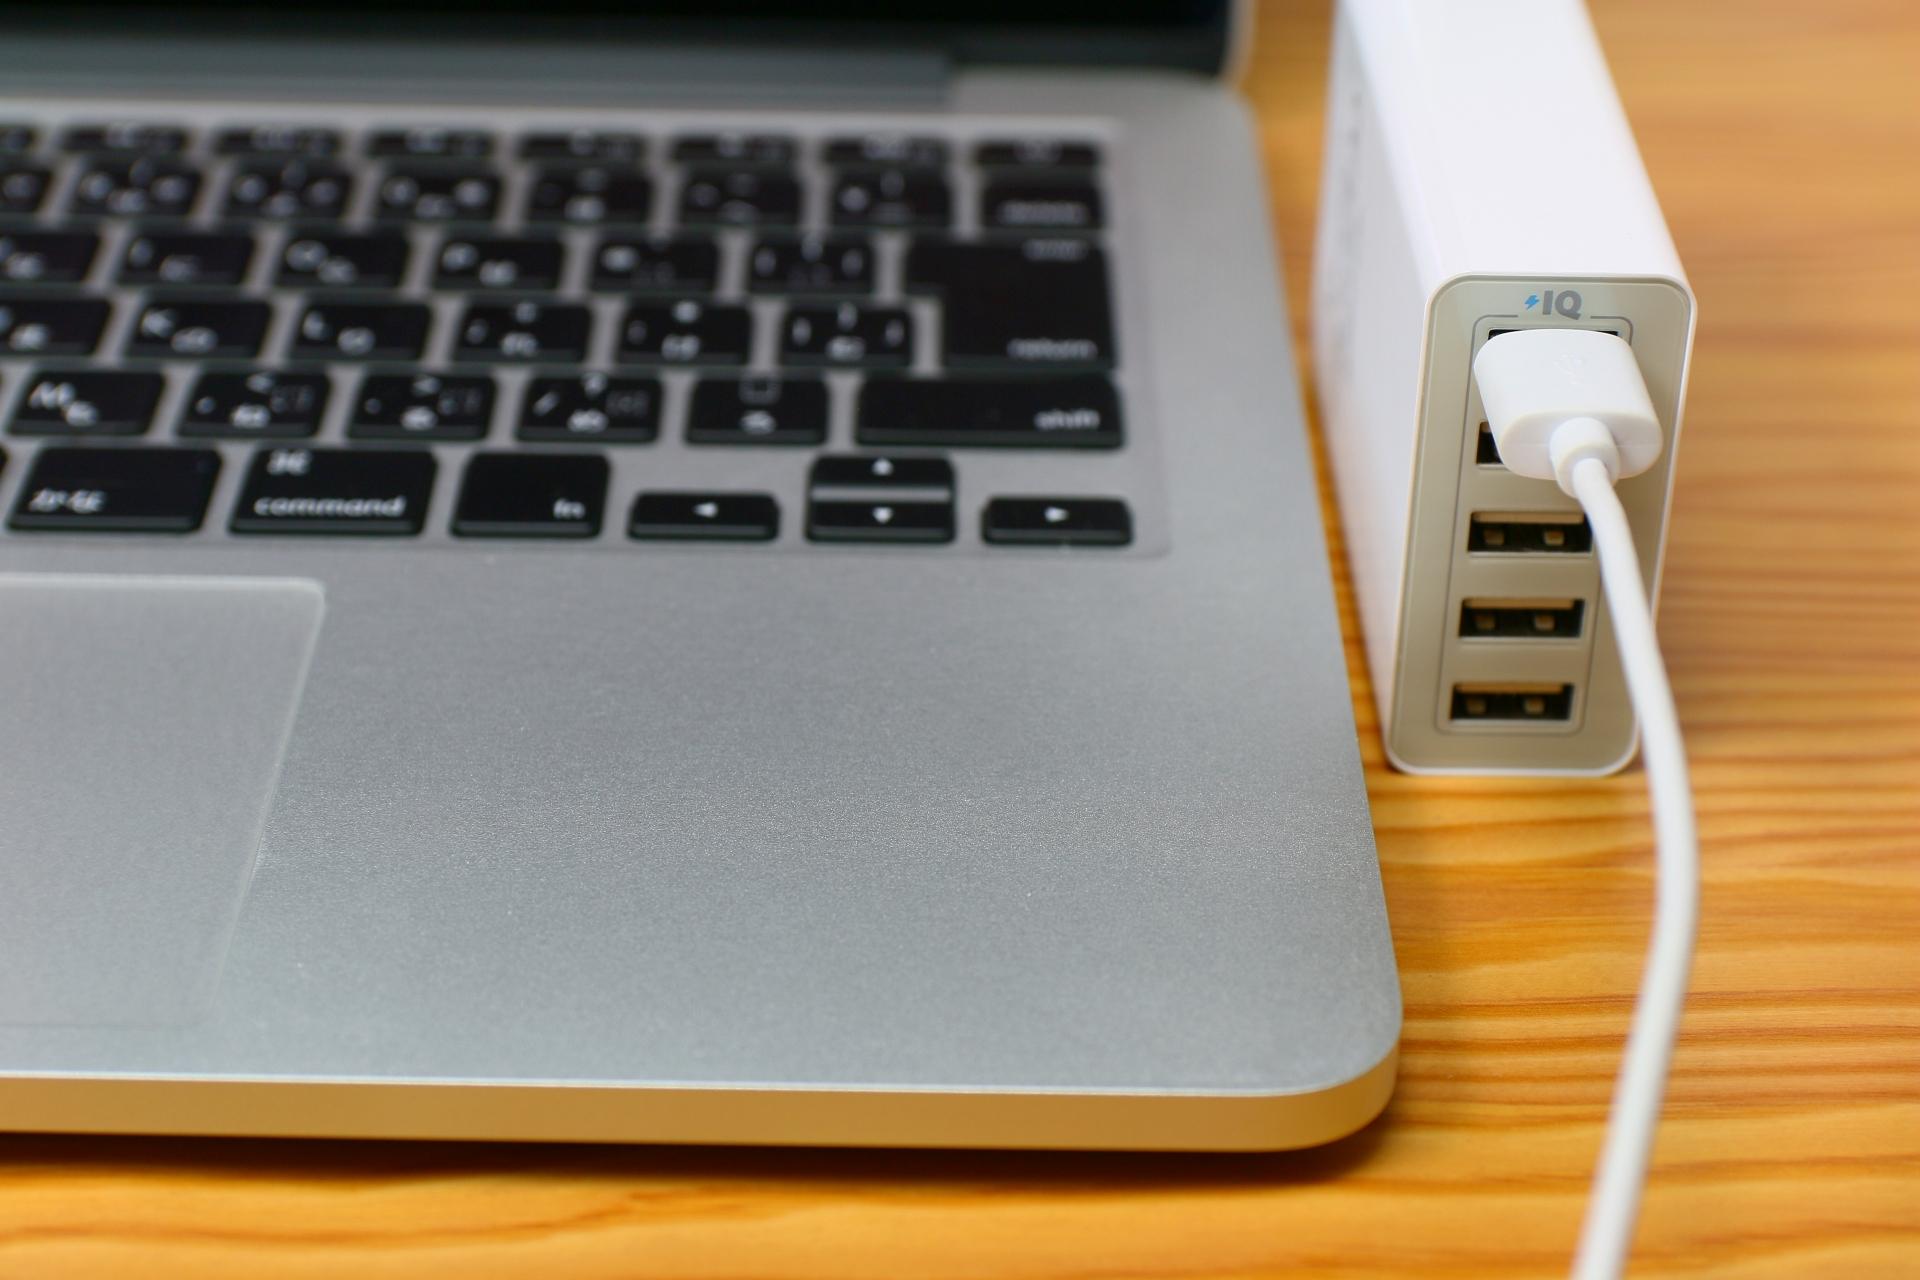 USB充電器のおすすめ9選!急速充電タイプも【2019年版】